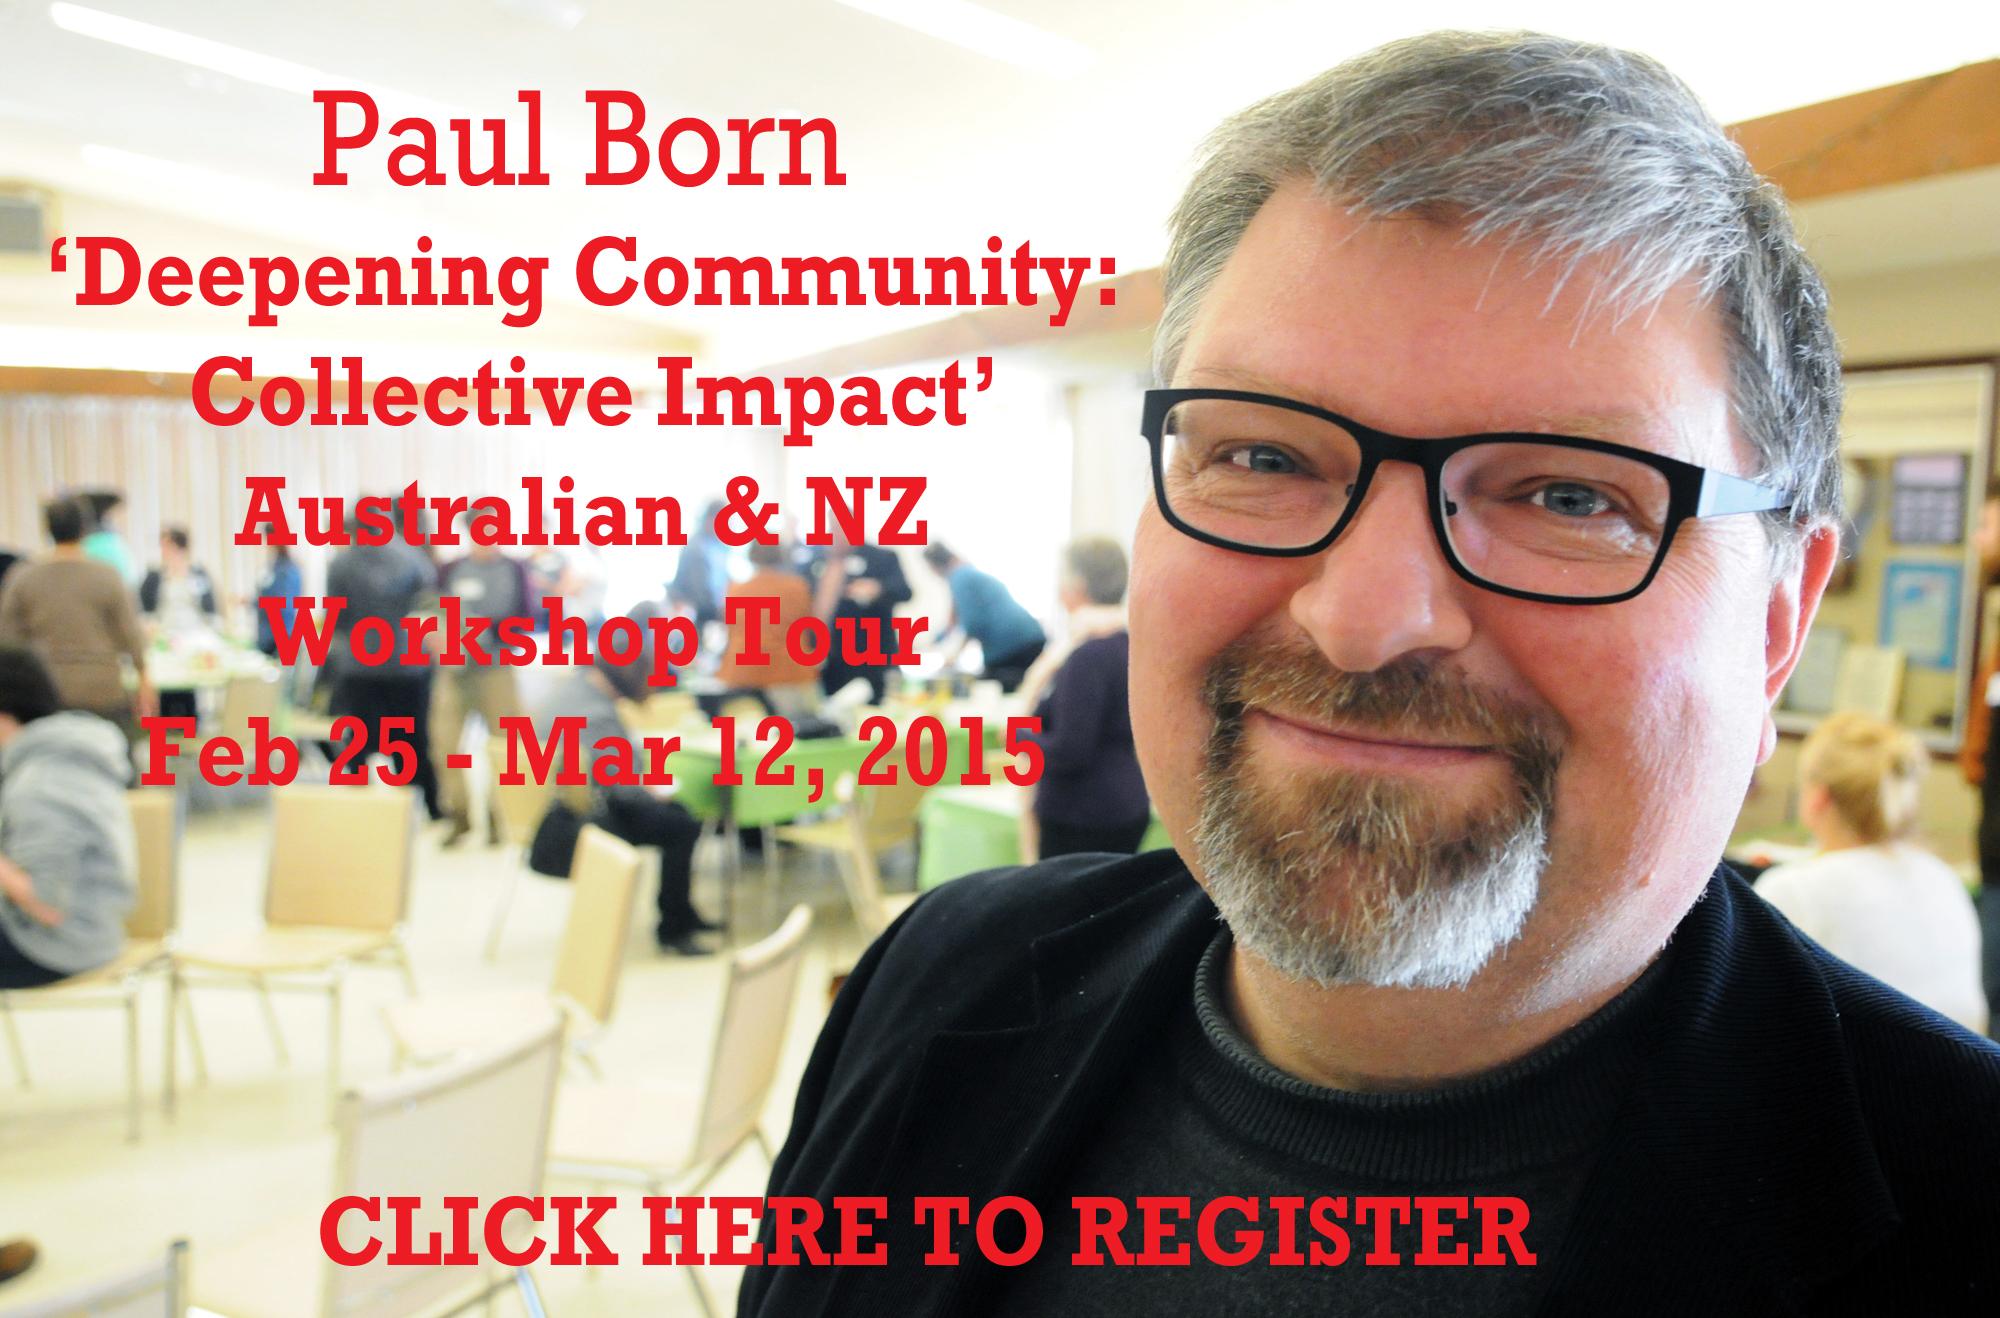 Paul Born Workshop Registration